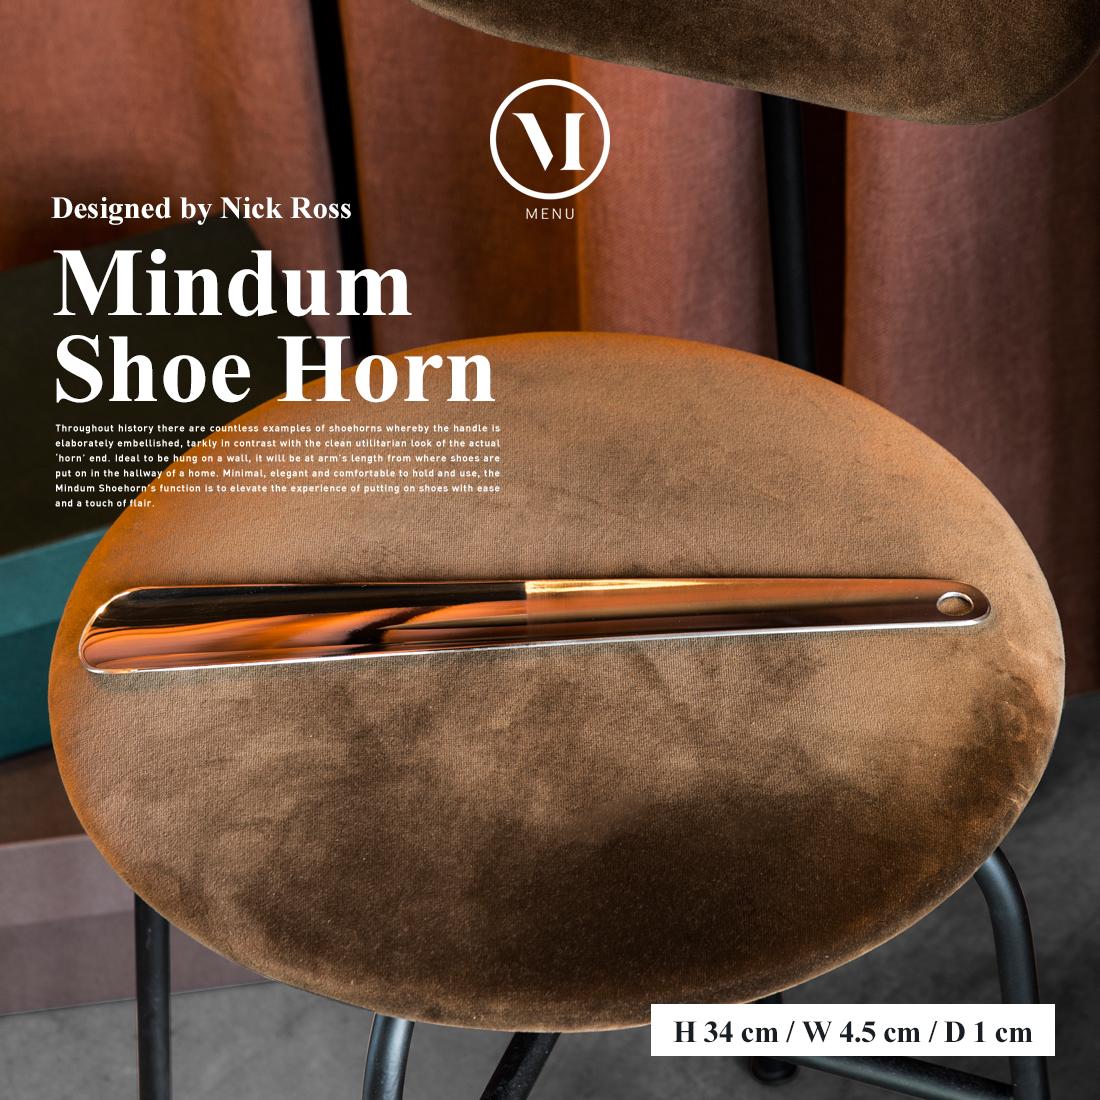 【menu メニュー】ミンダムシューホーン フック付き靴べら 靴ベラ 玄関 コンビニ受取対応